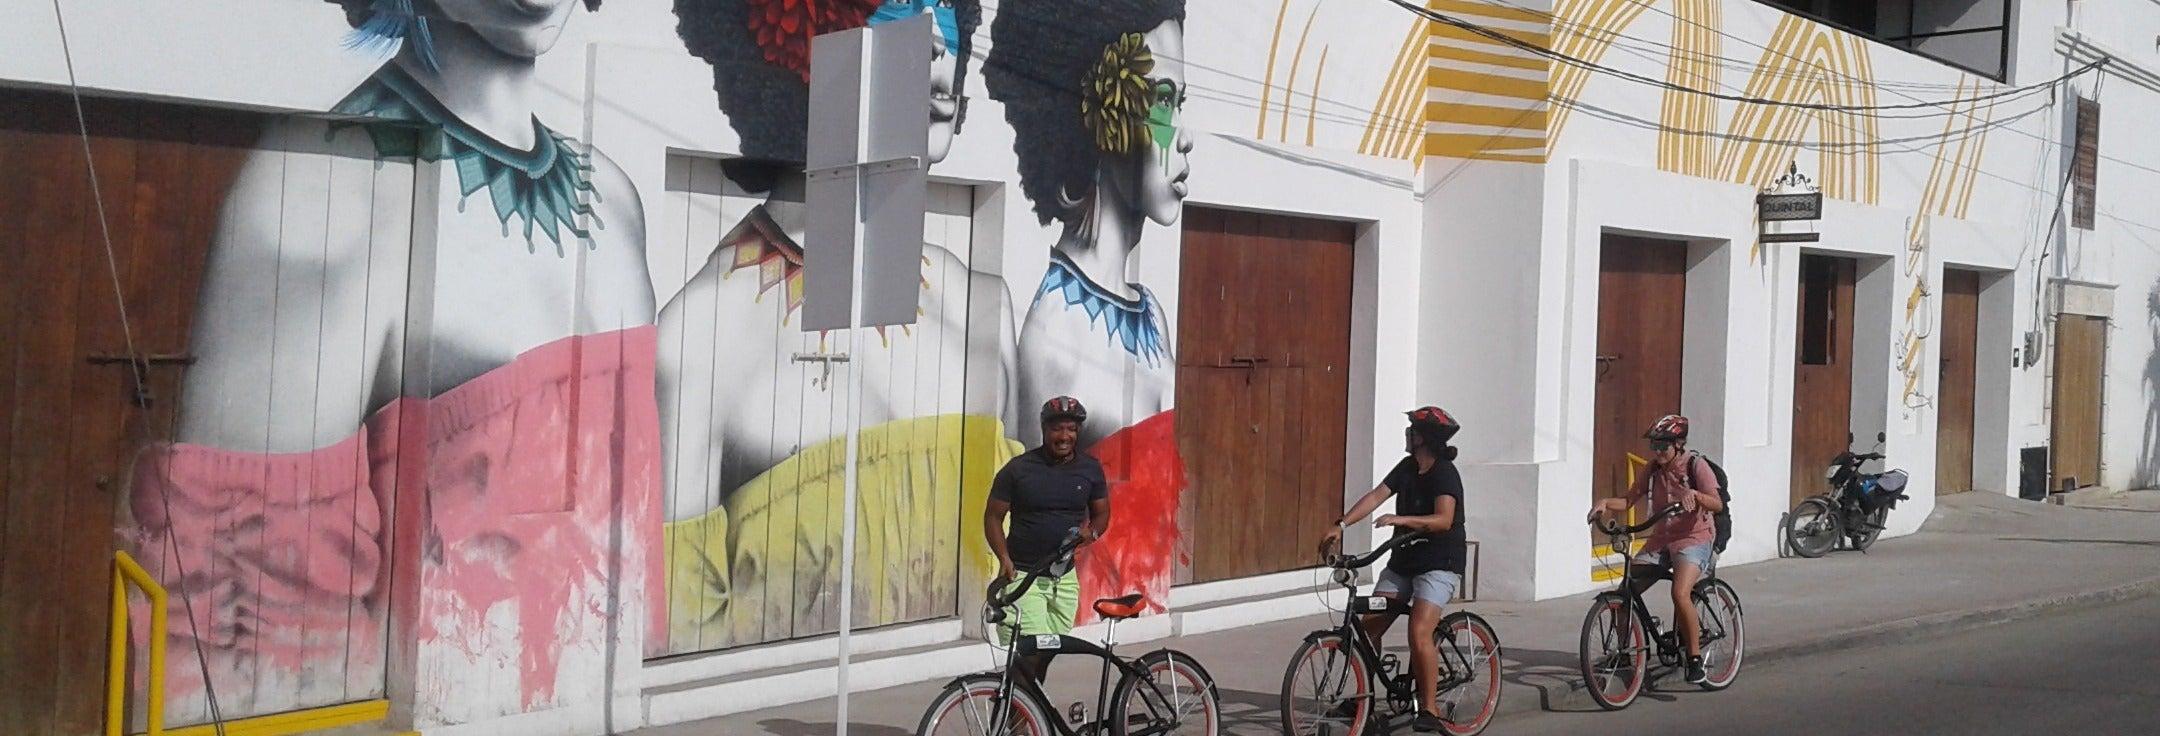 Cartagena Bike Tour